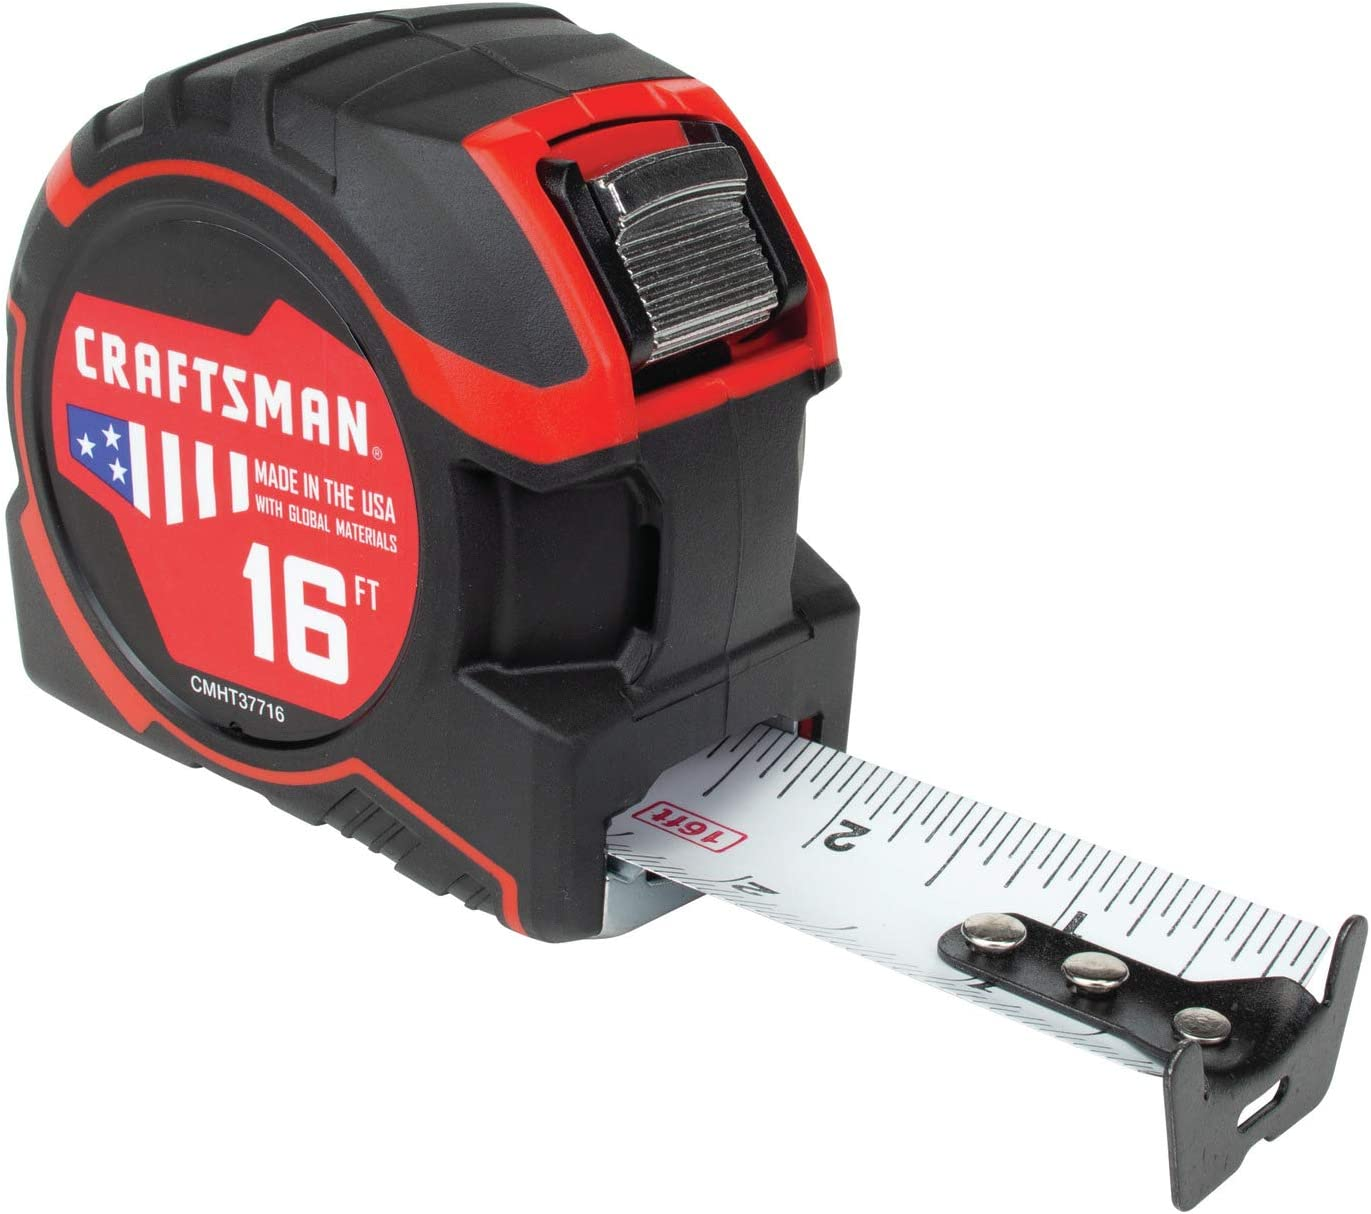 CMHT37726S CRAFTSMAN Tape Measure 26-Foot